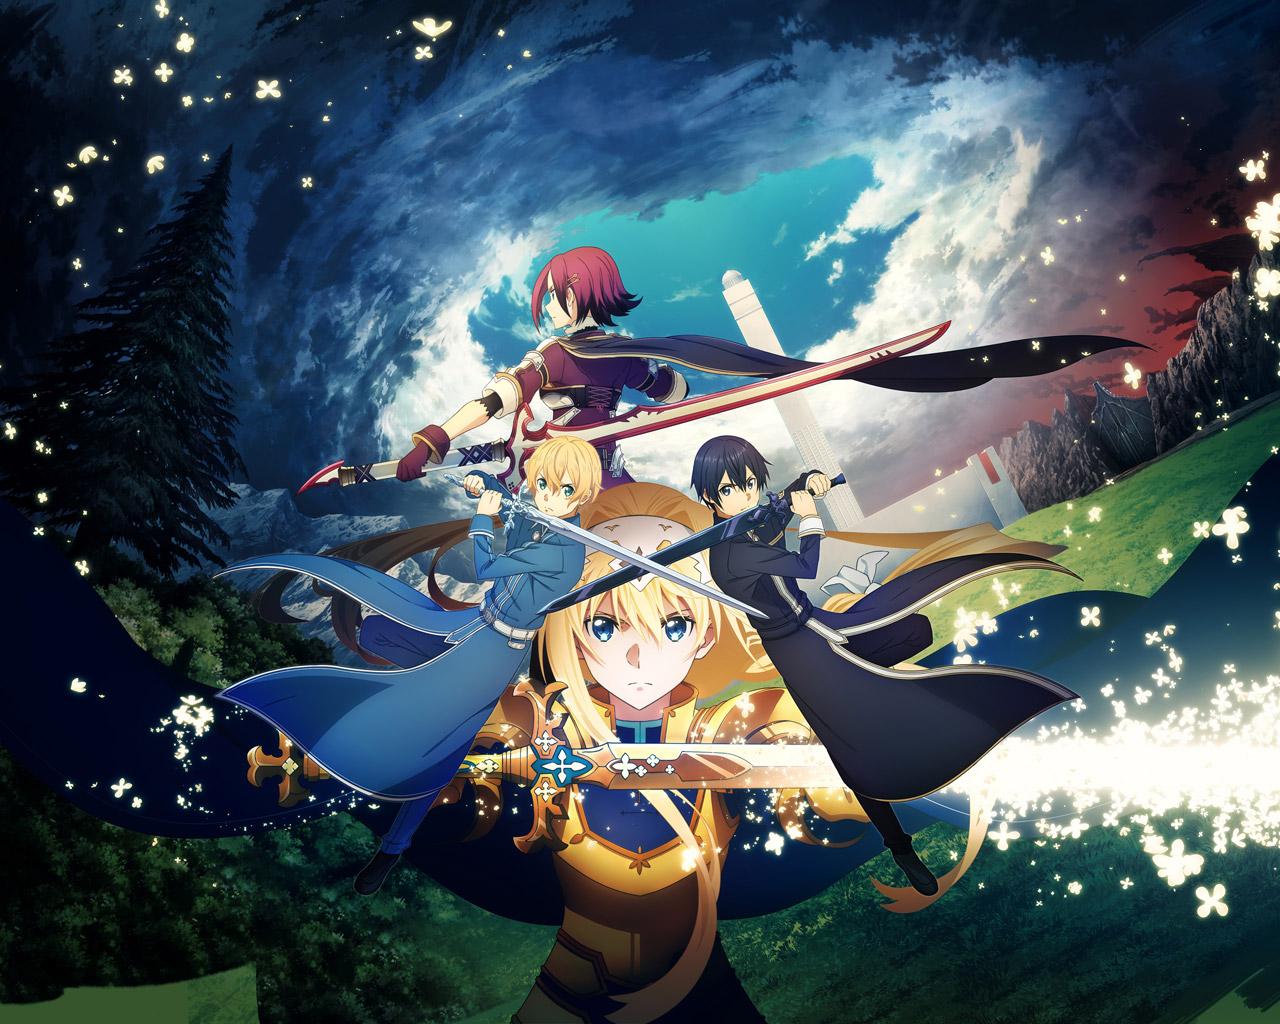 Sword Art Online: Alicization Lycoris Wallpaper in 1280x1024